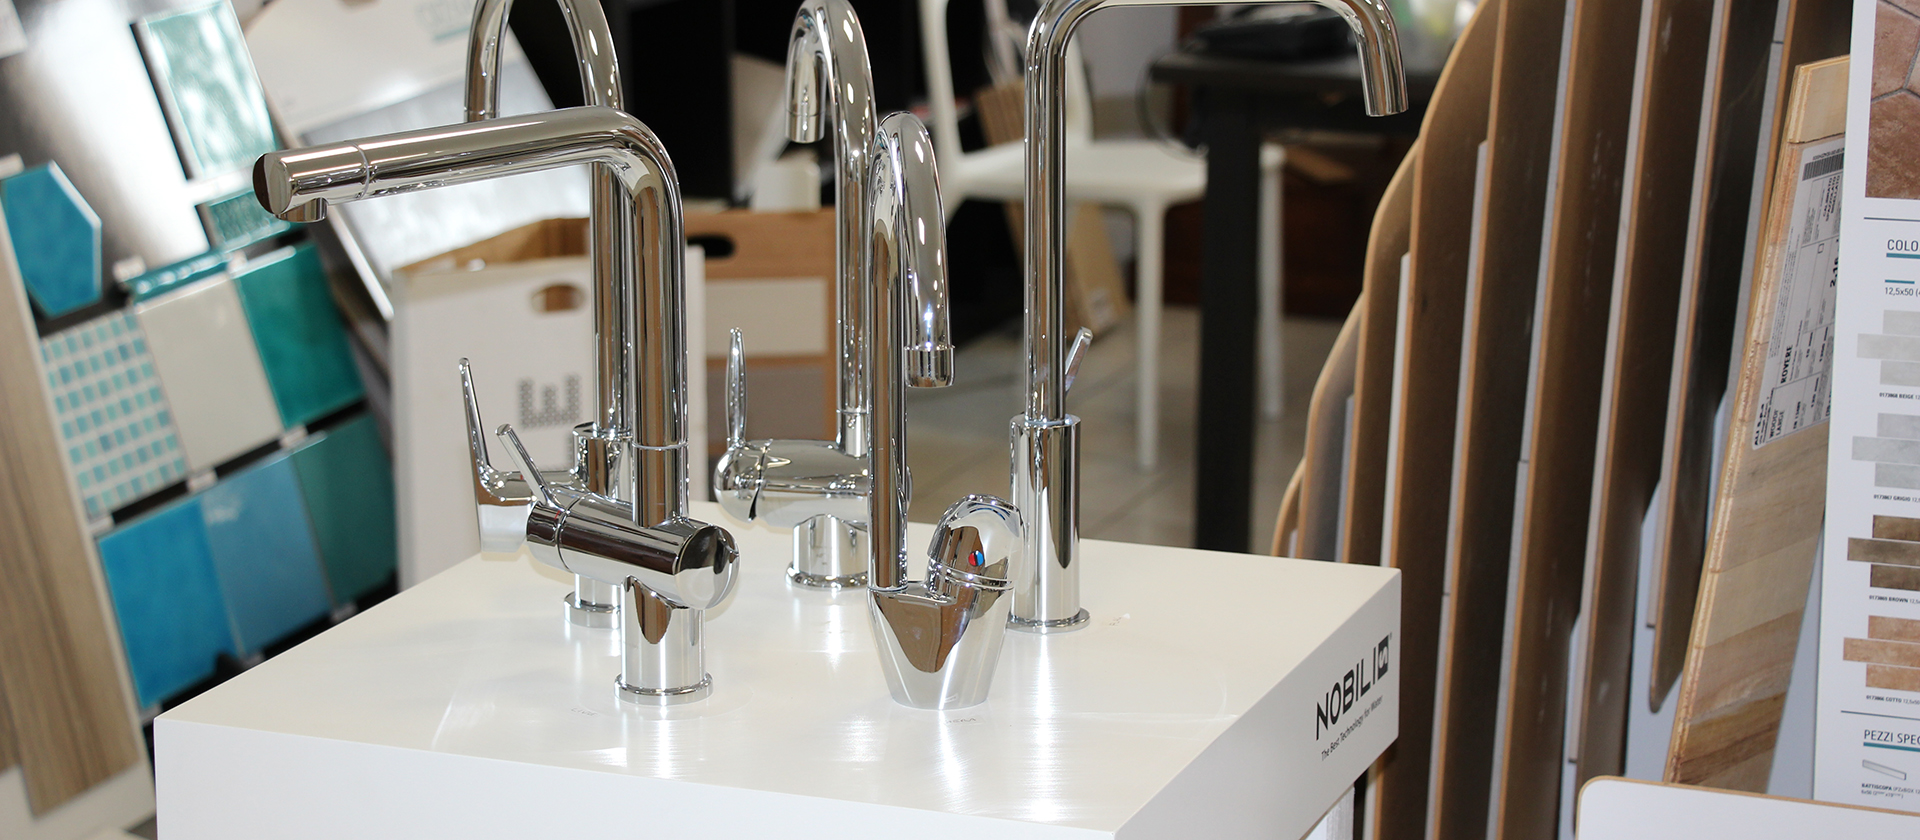 Sanitari e rubinetteria Colli al Metauro Pesaro Urbino Centrotubi